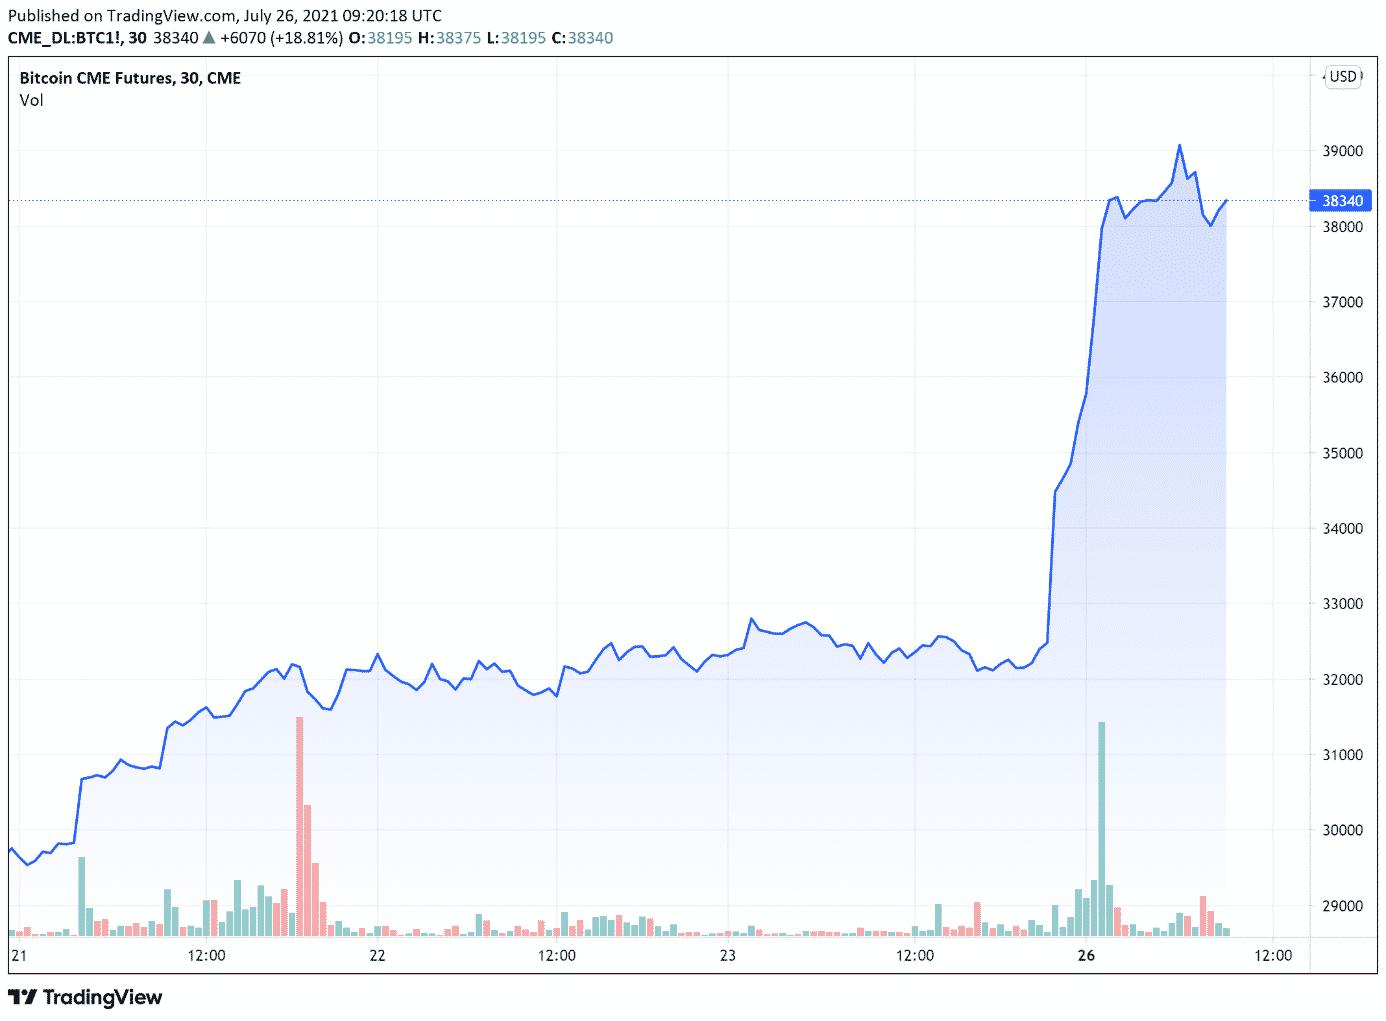 cours du bitcoin lundi 26 juillet 2021